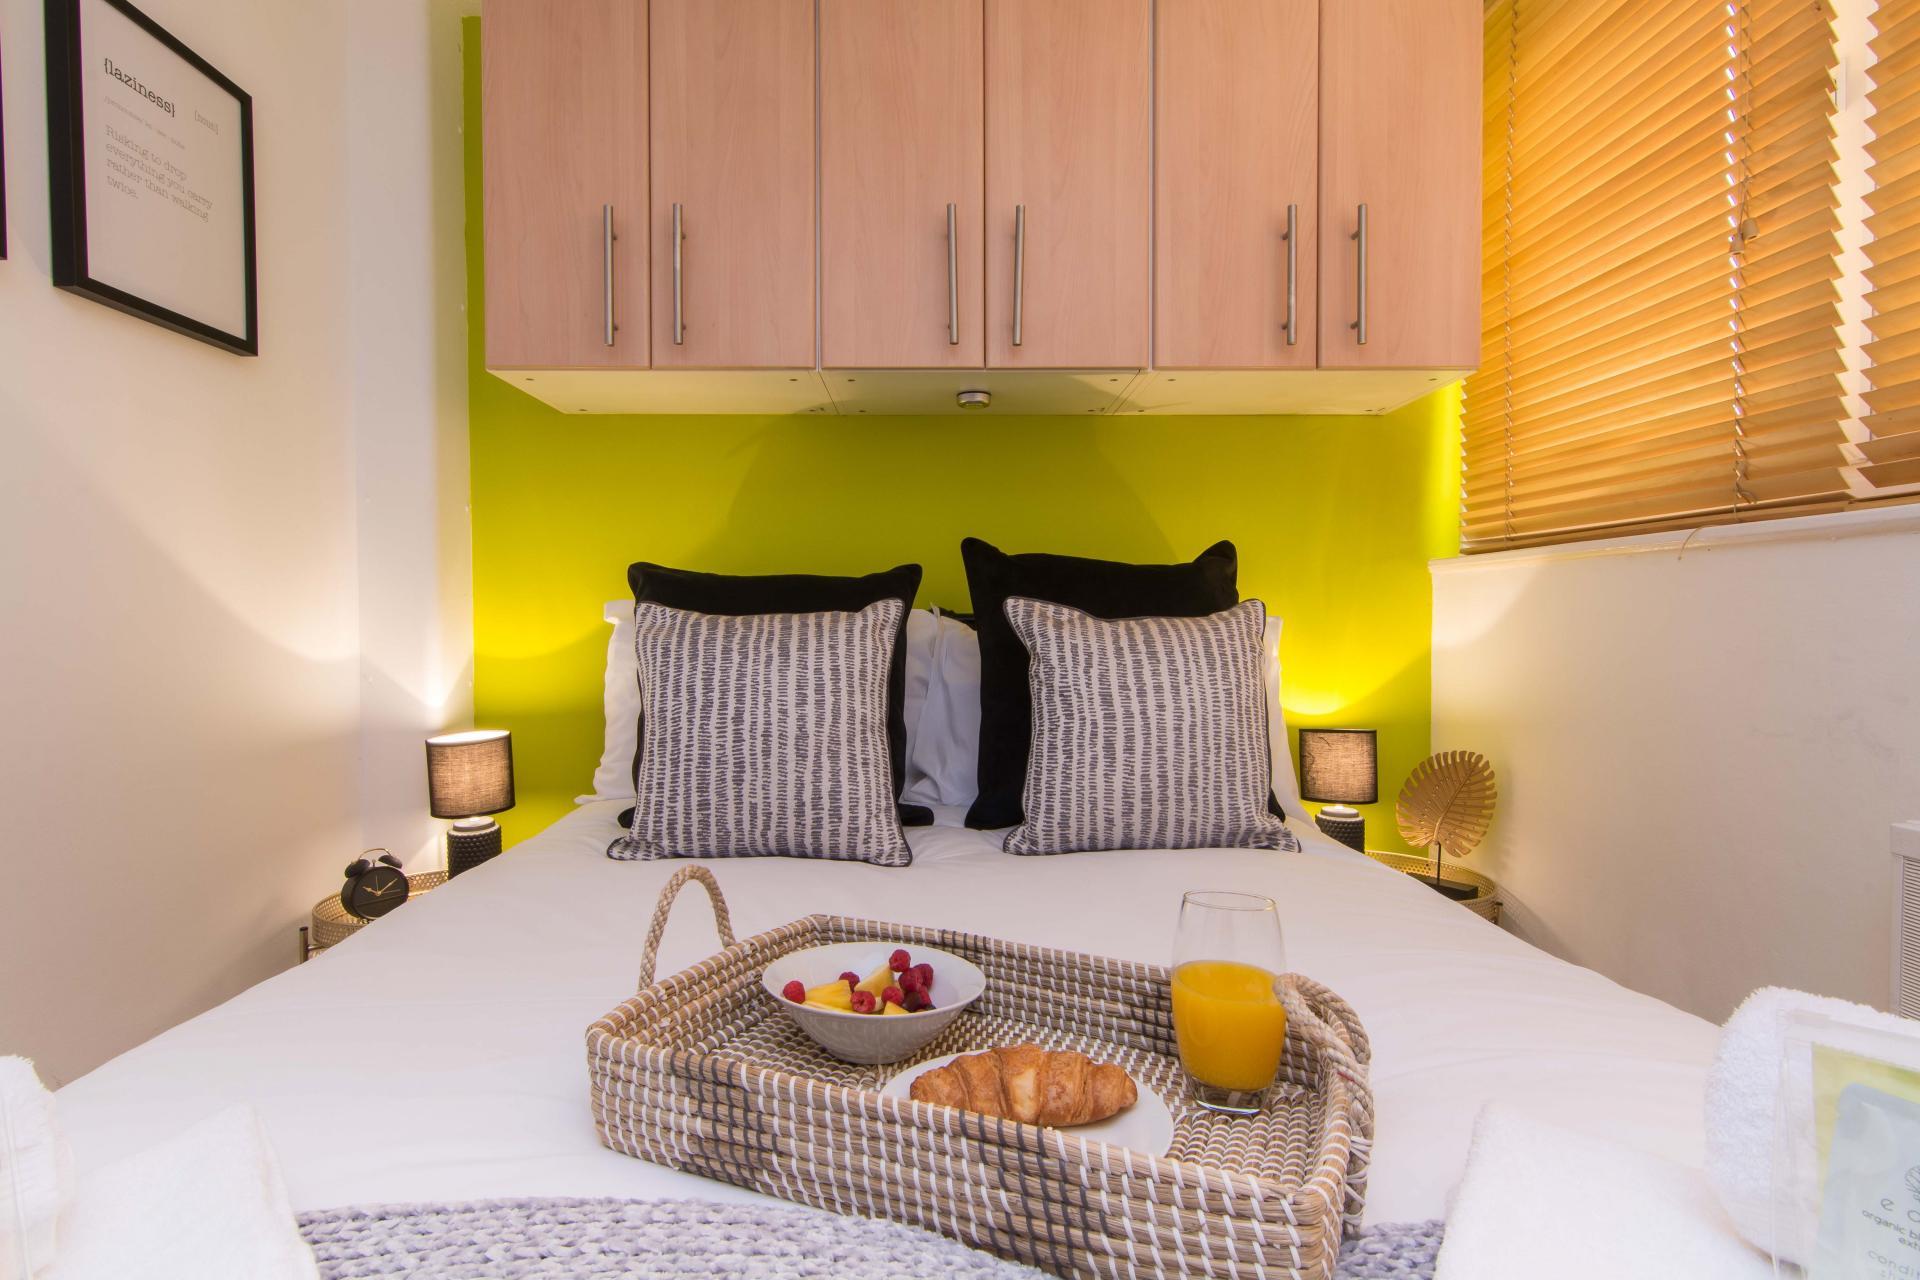 Bedroom at Victoria Centre Apartment, Centre, Nottingham - Citybase Apartments